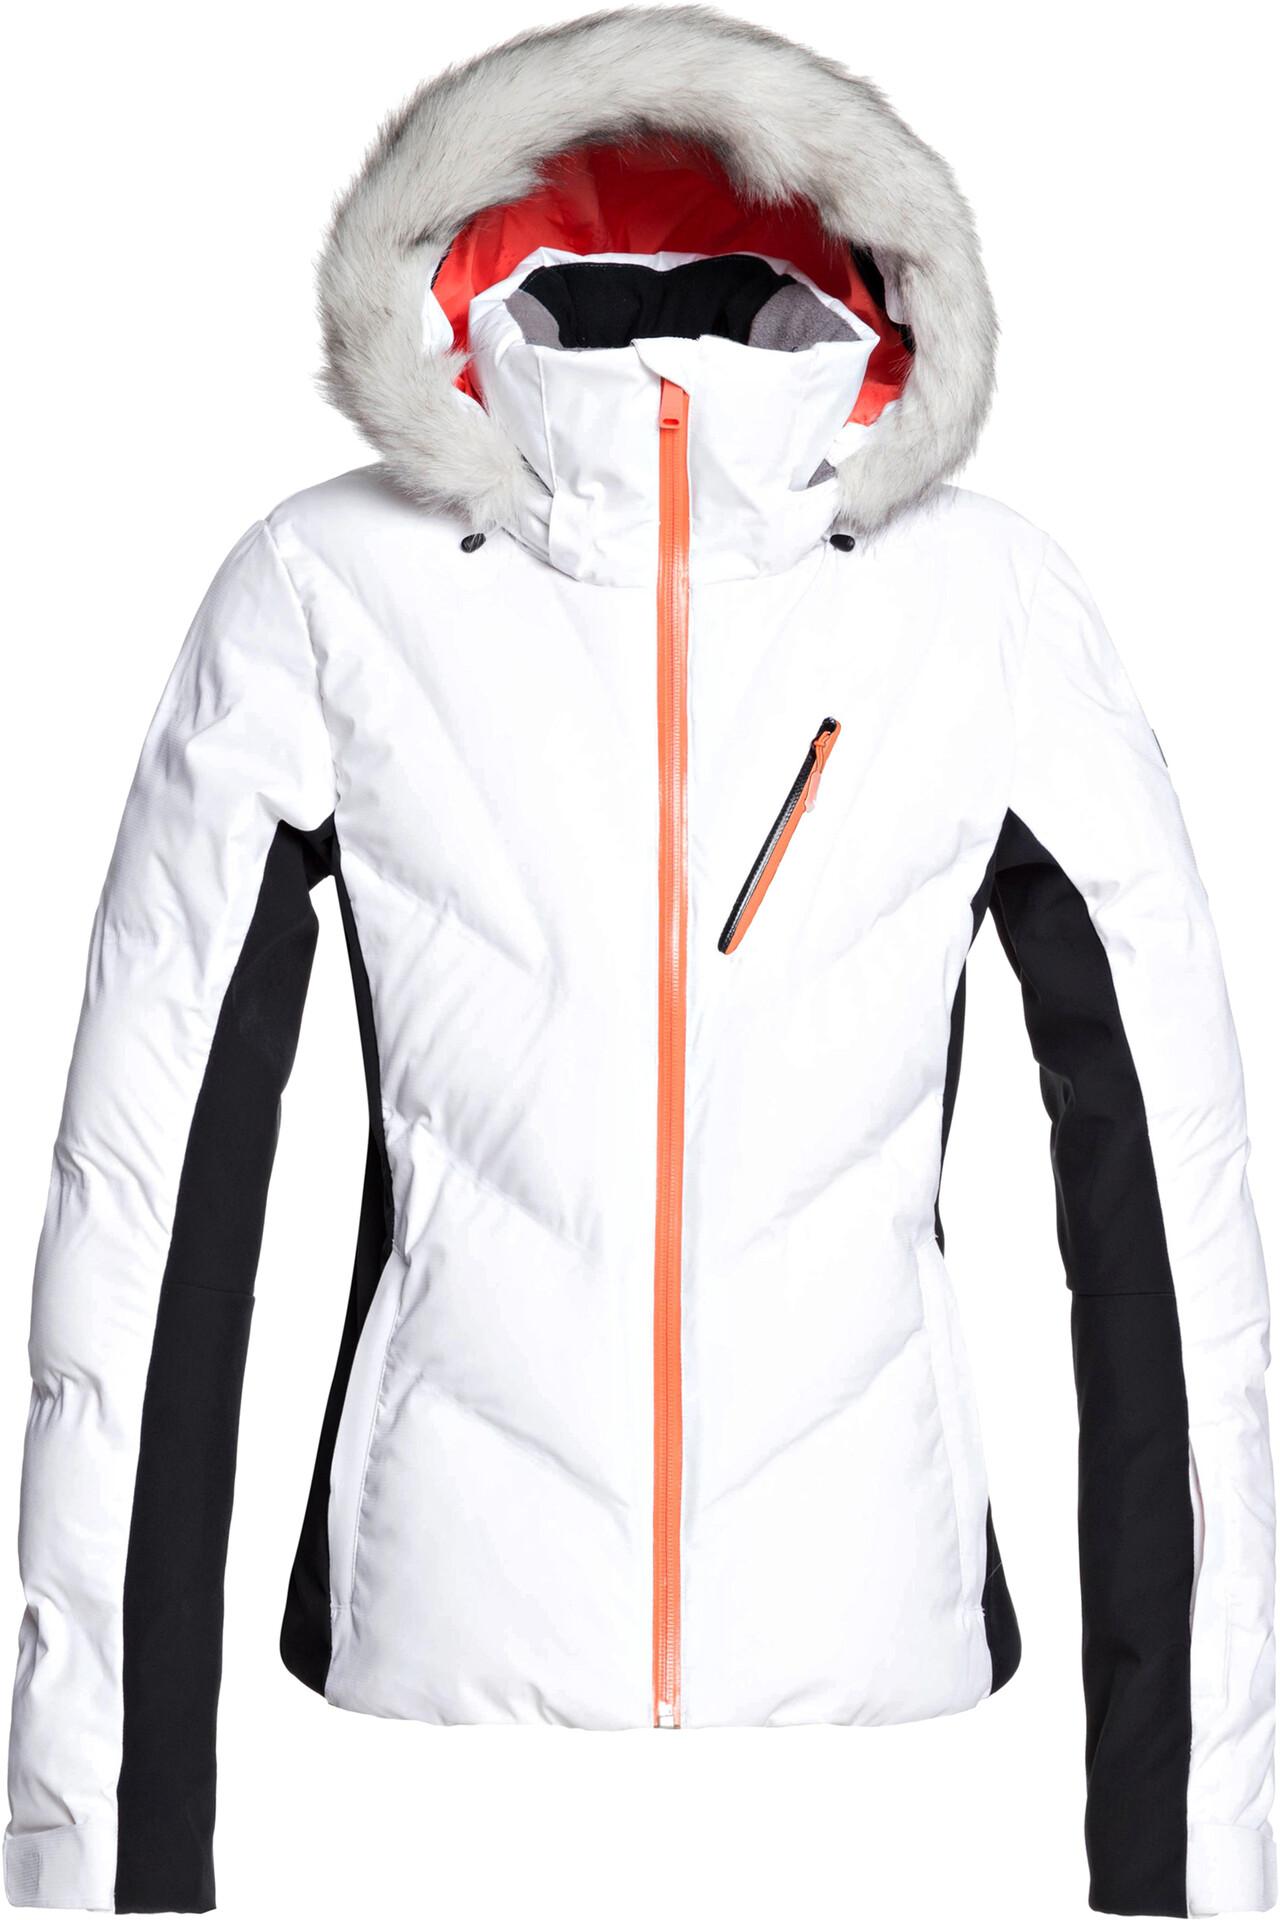 Jacket Women Snowstorm Roxy White Bright u3lFK1JTc